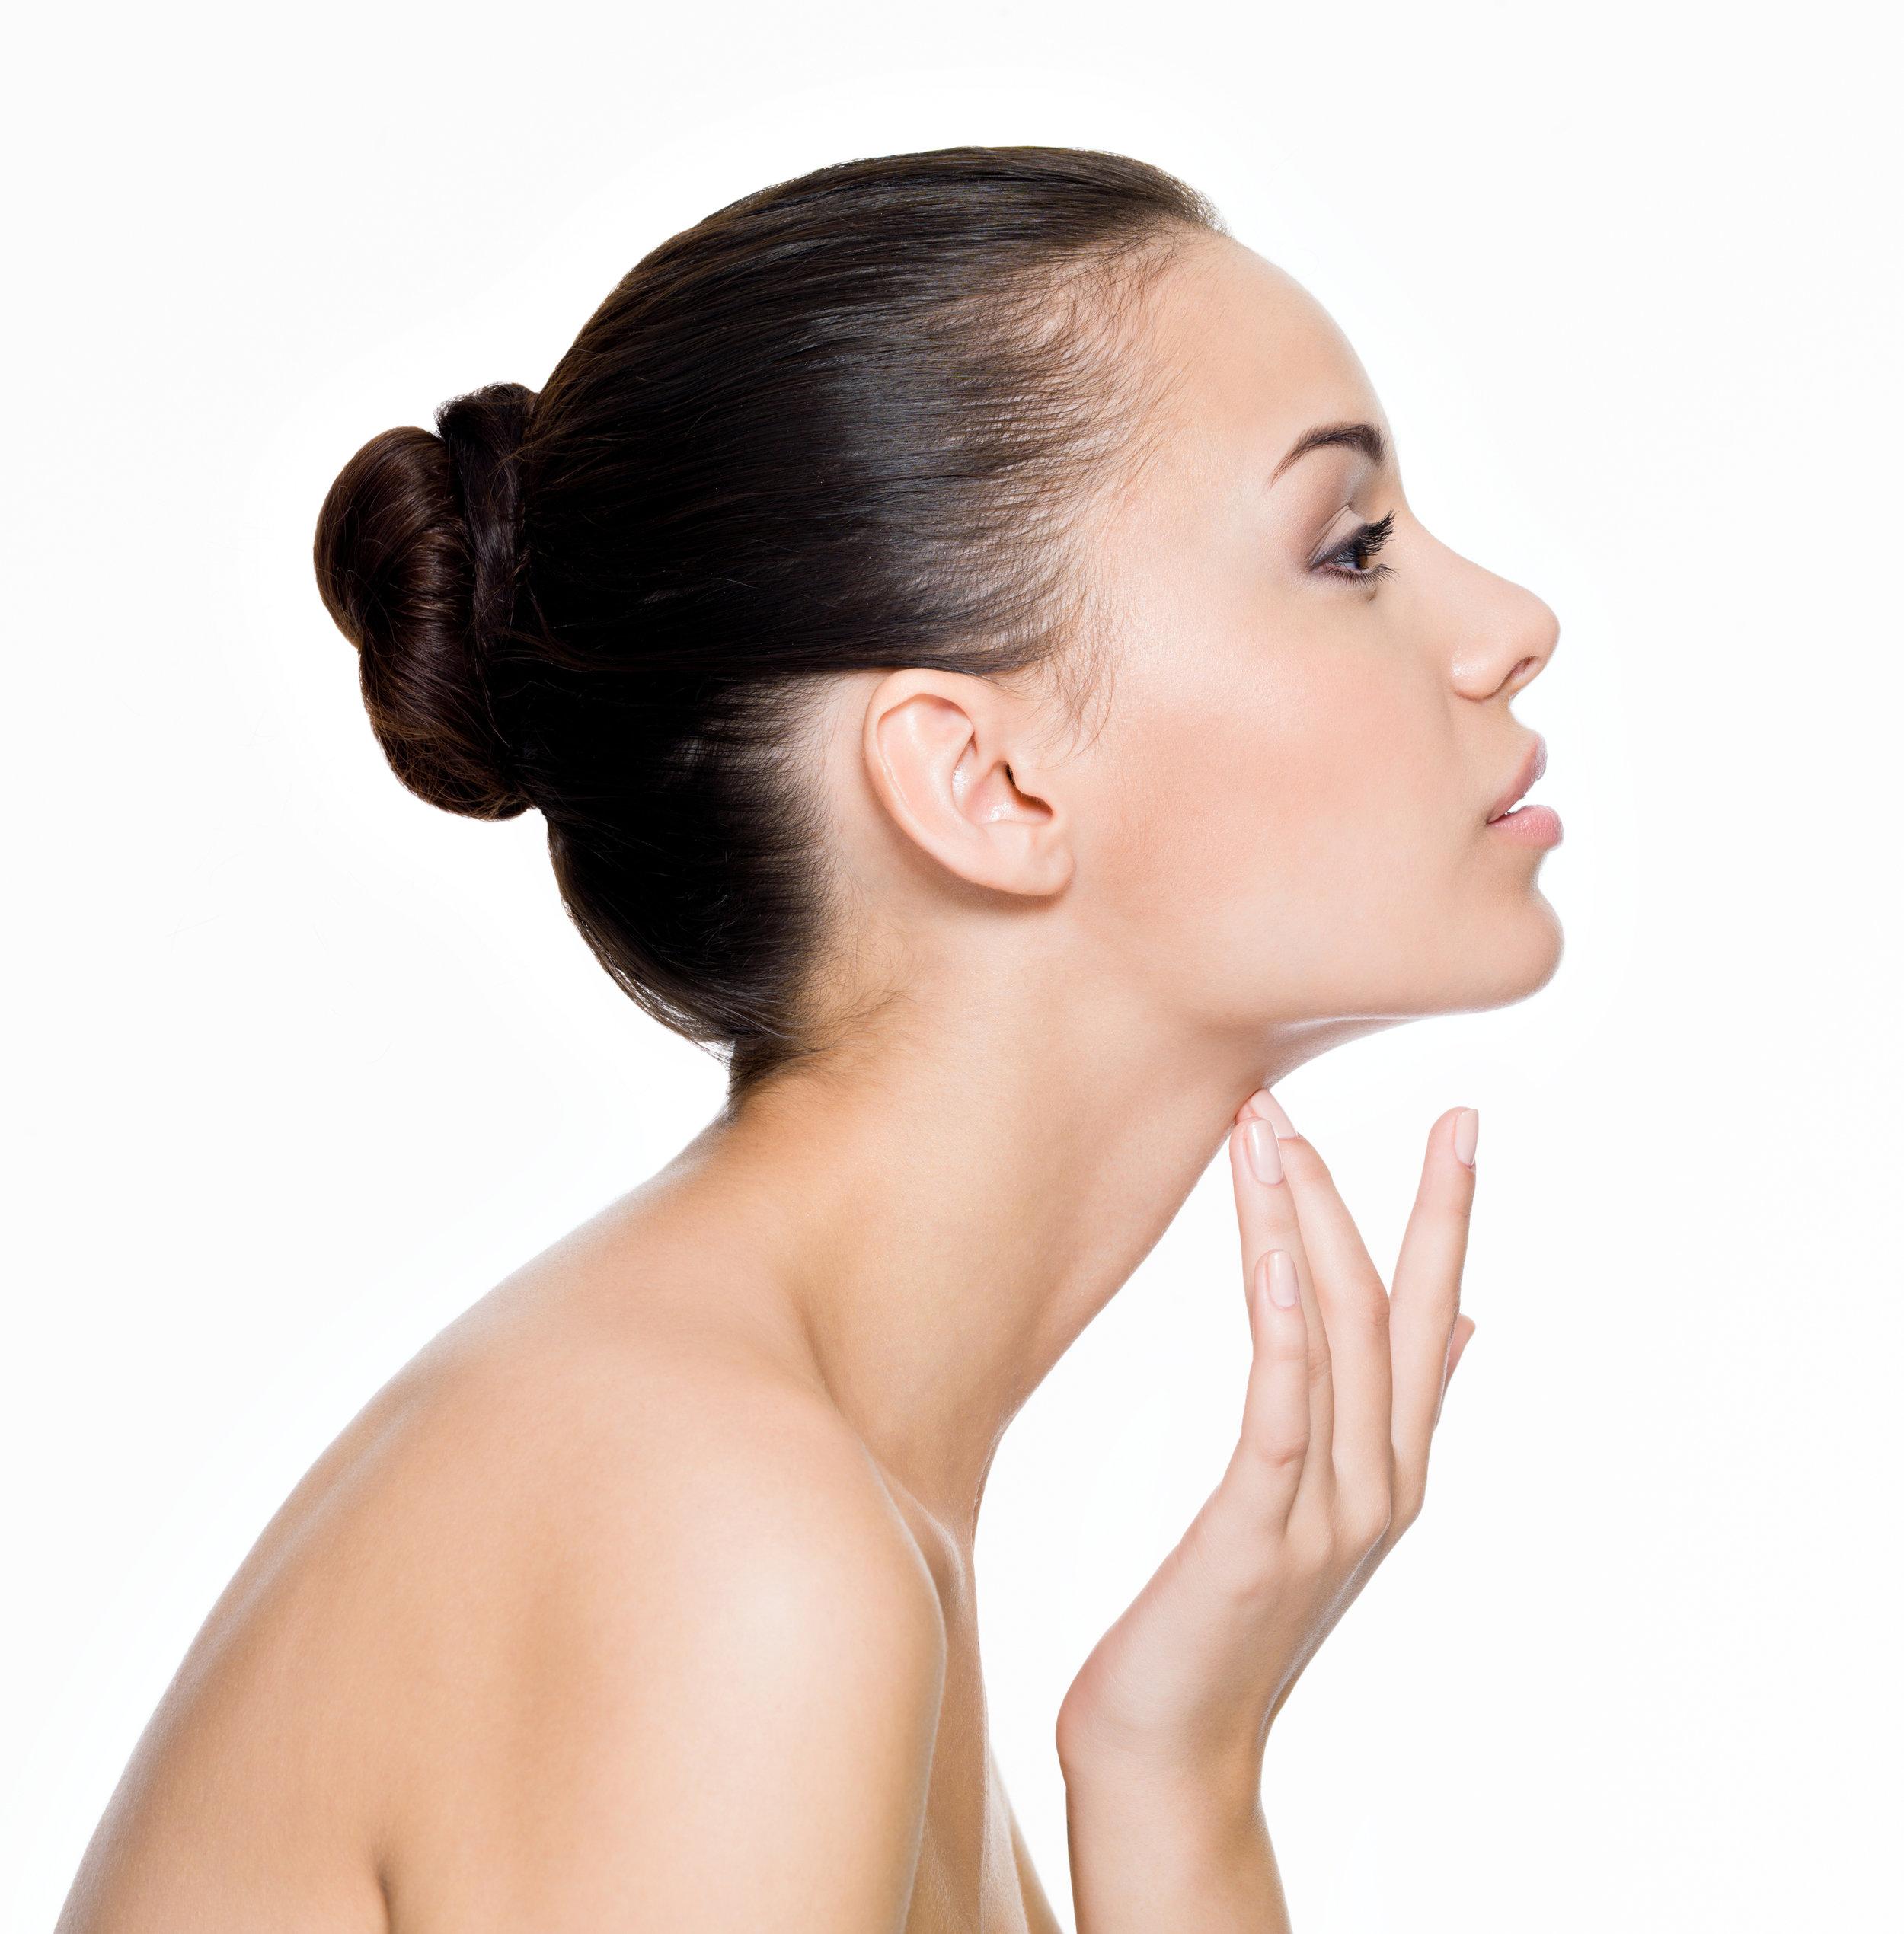 Custom Jaw and Chin Implants | Beverly Hills Plastic Surgeon